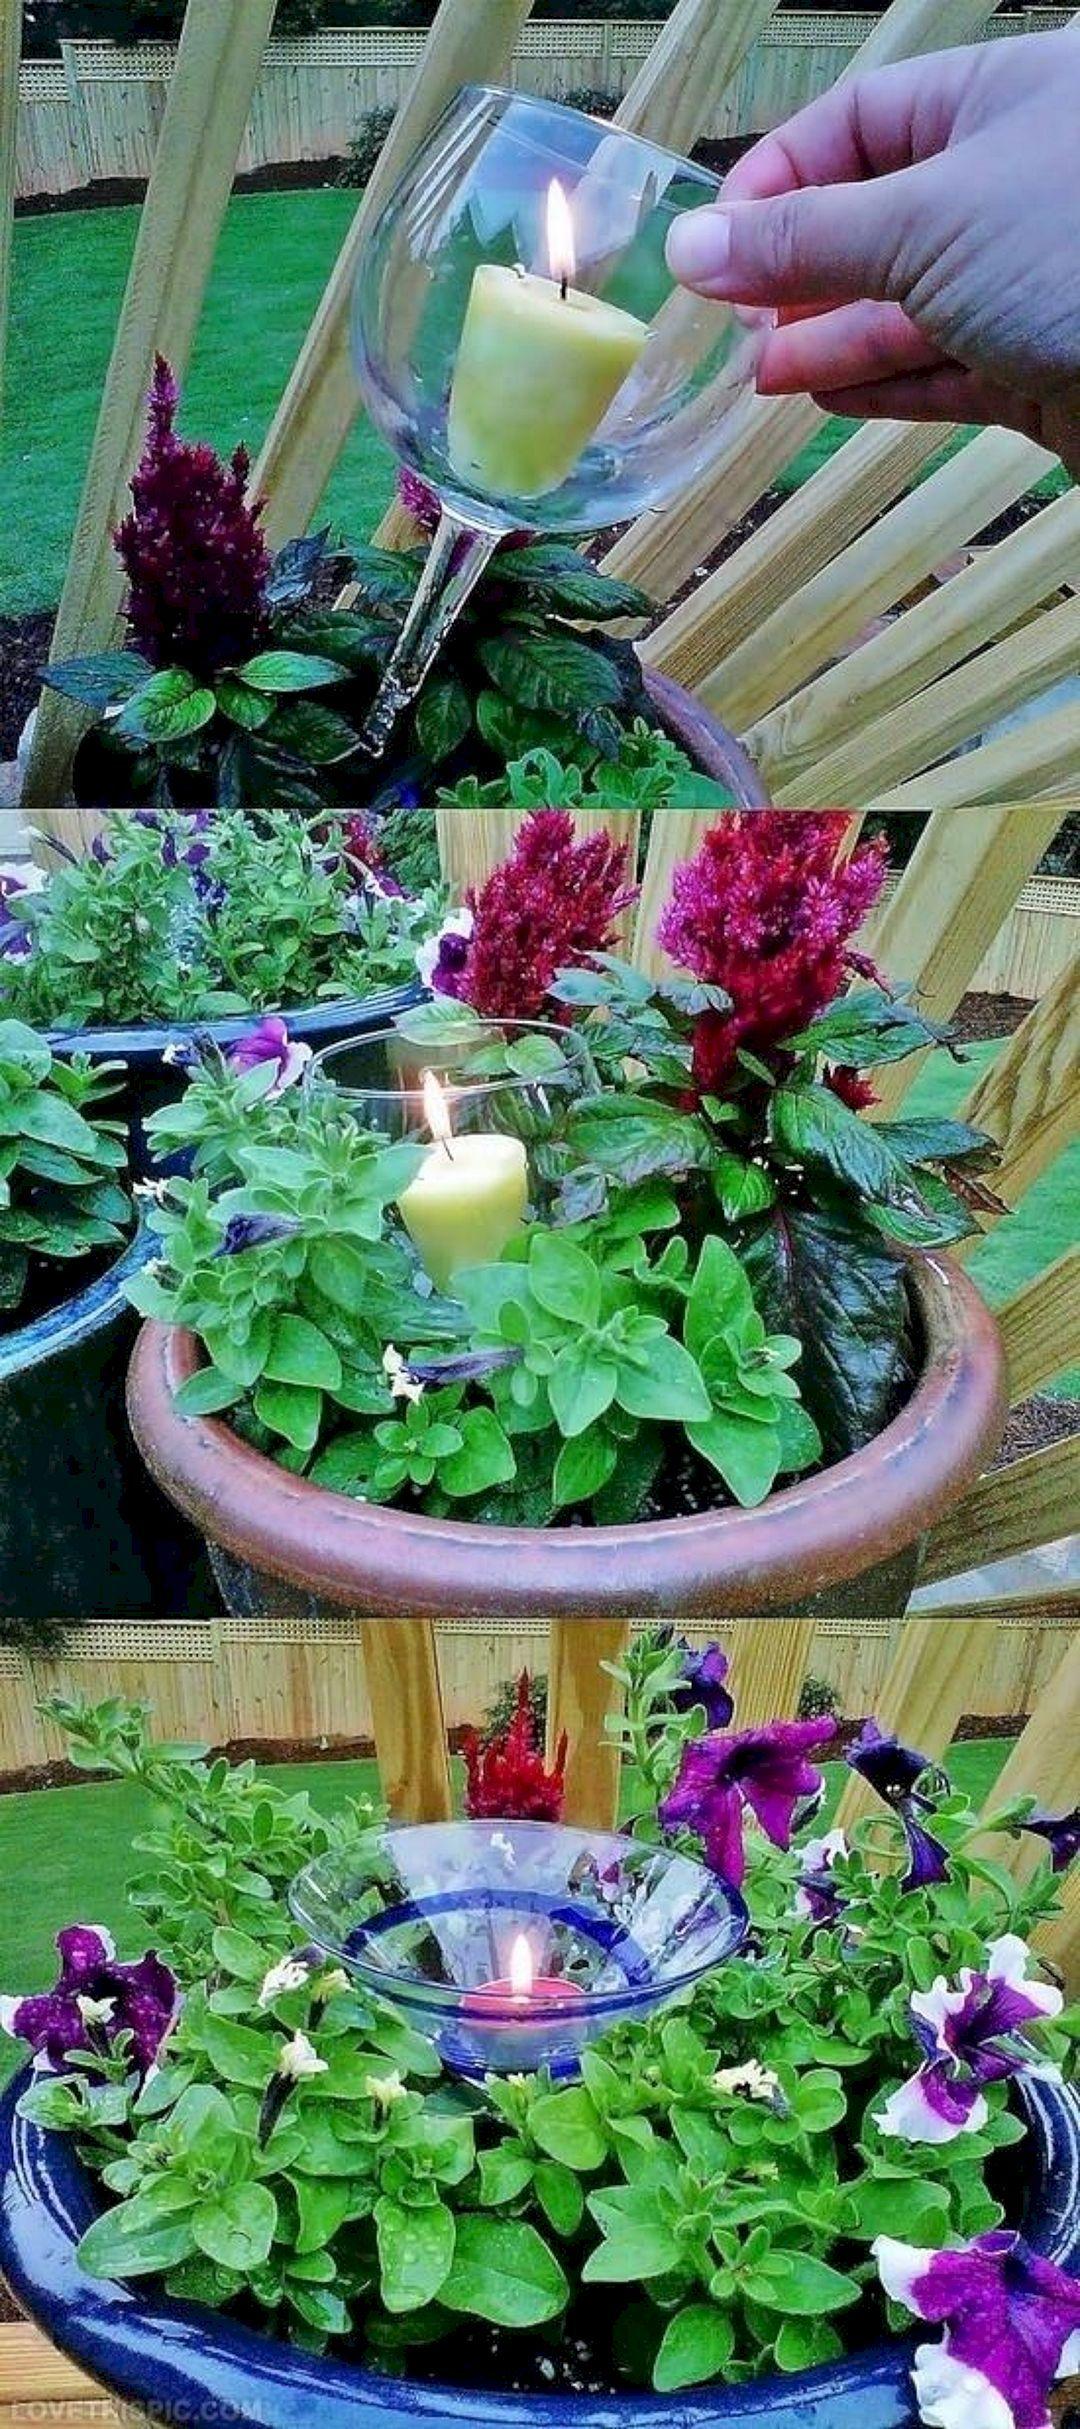 80 Brilliant DIY Vintage and Rustic Garden Decor Ideas on A Budget ...